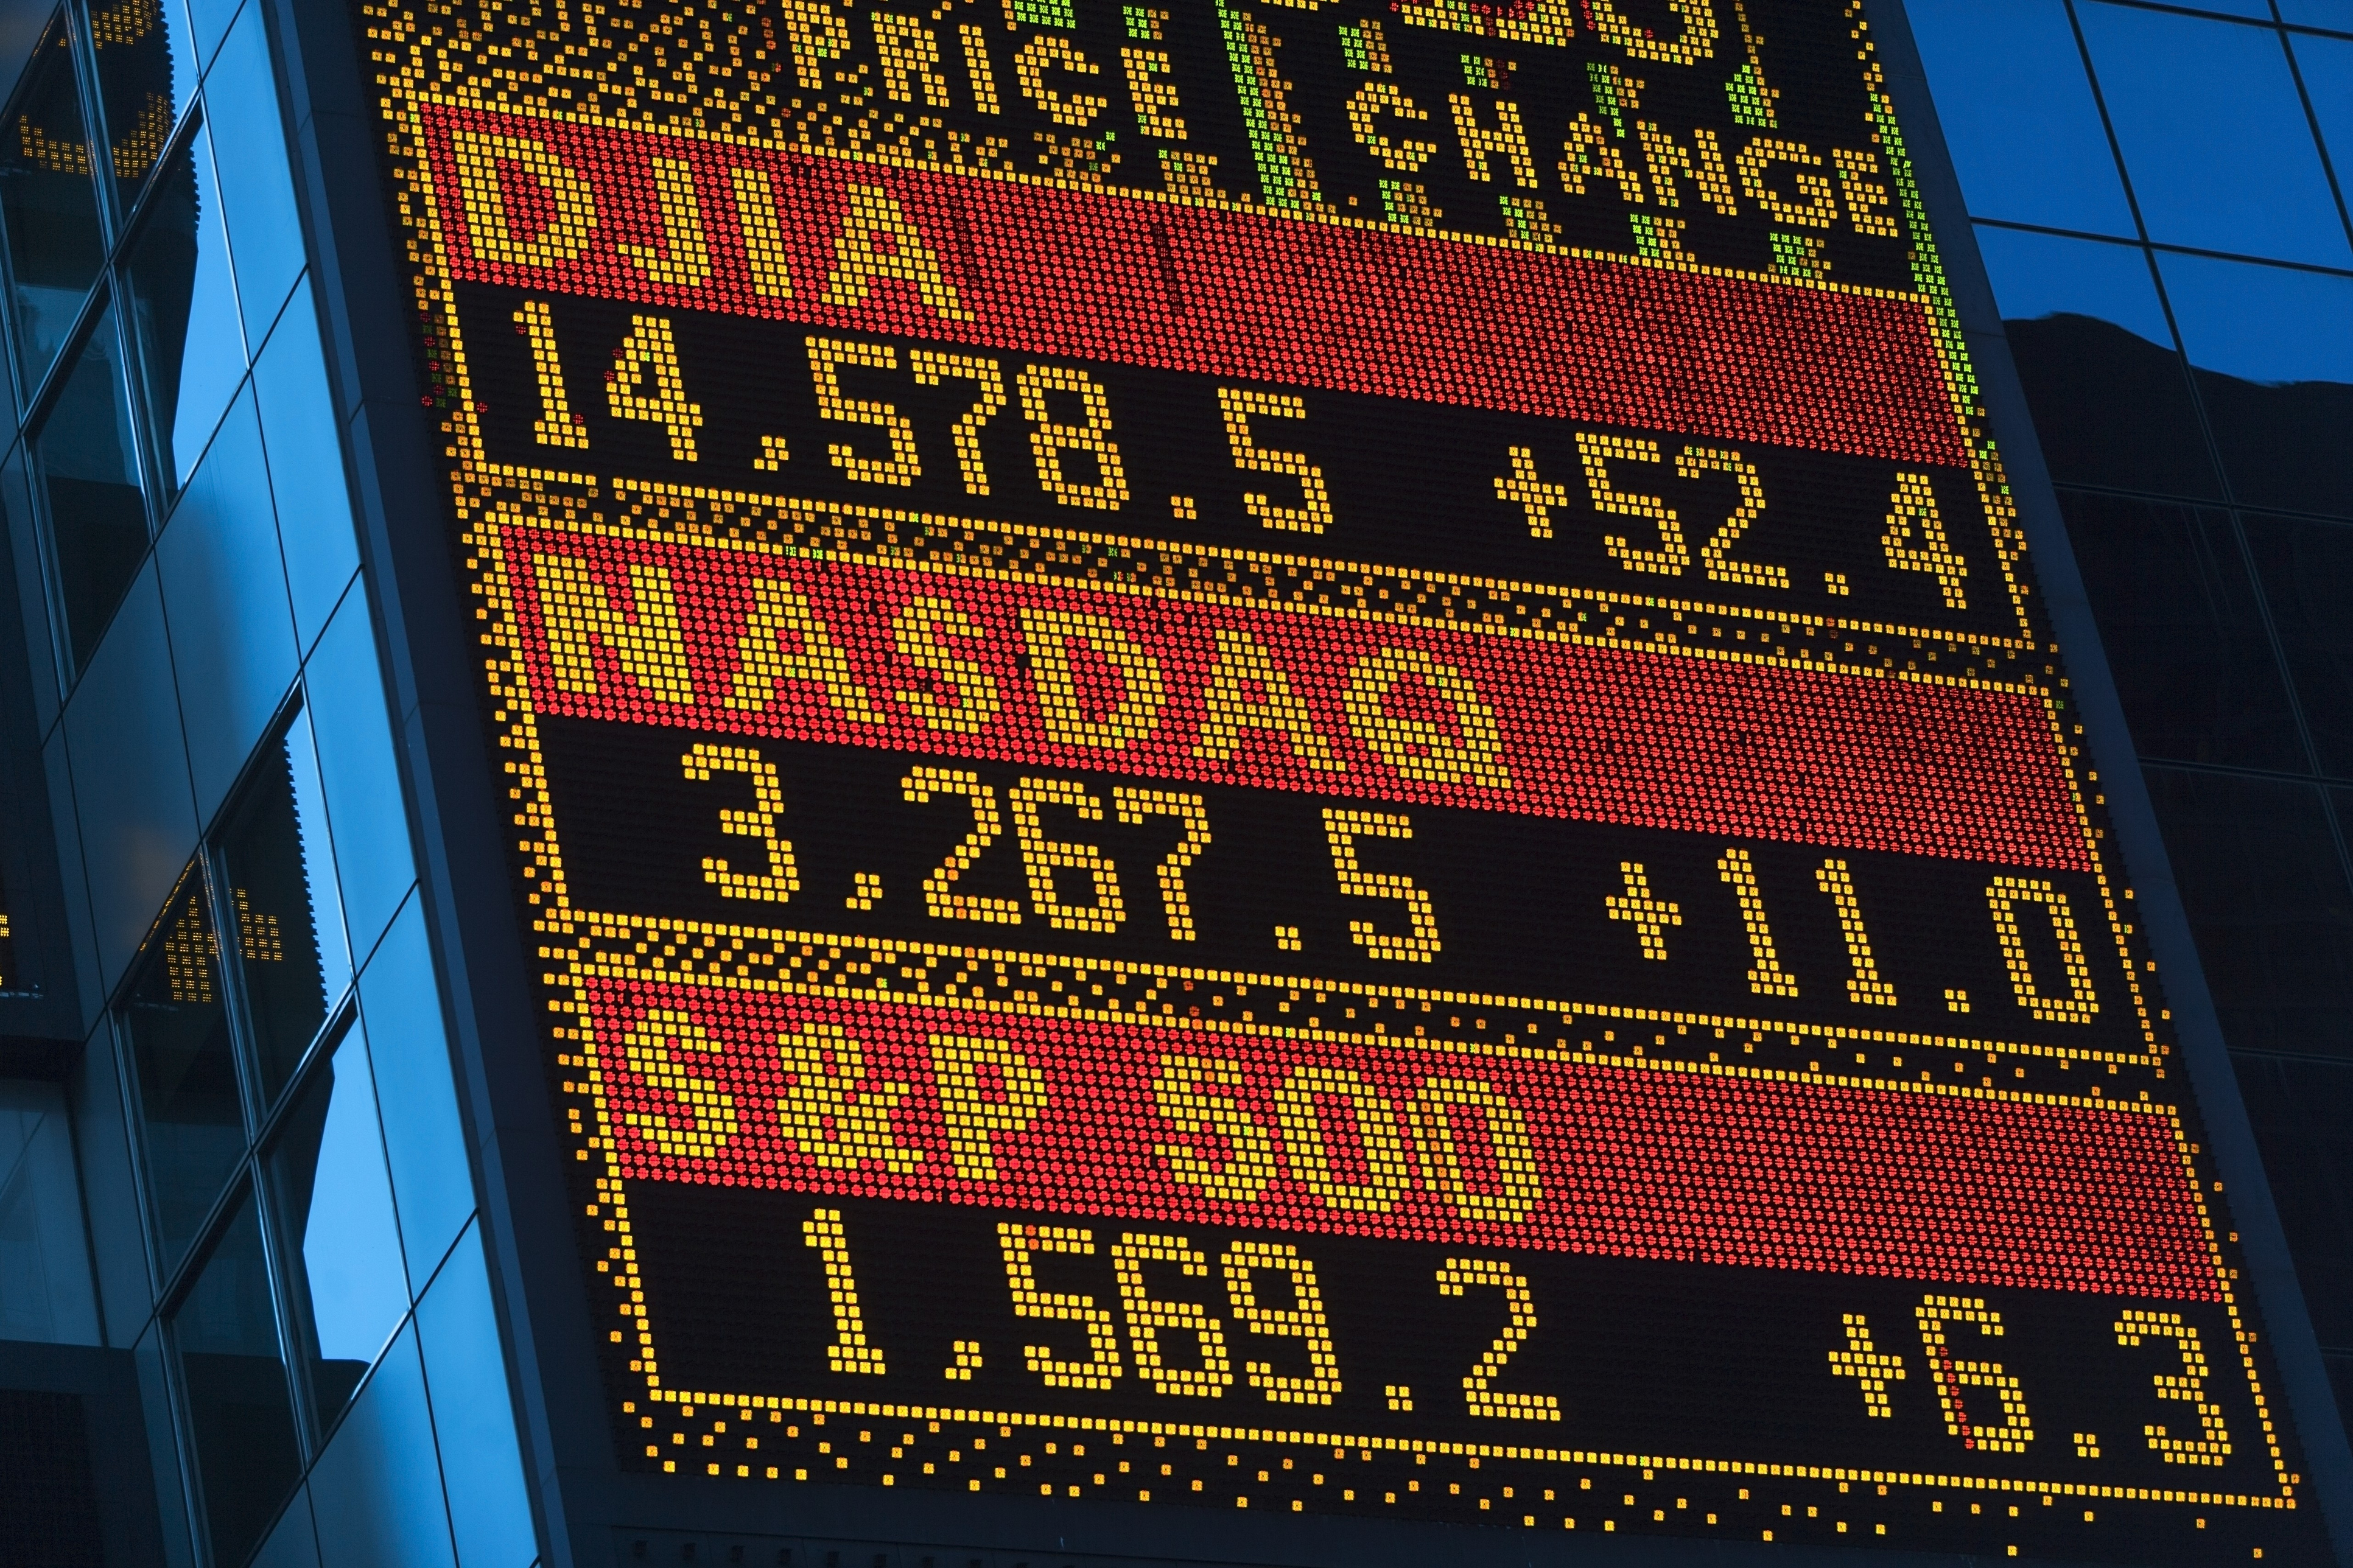 Stock options subject to erisa